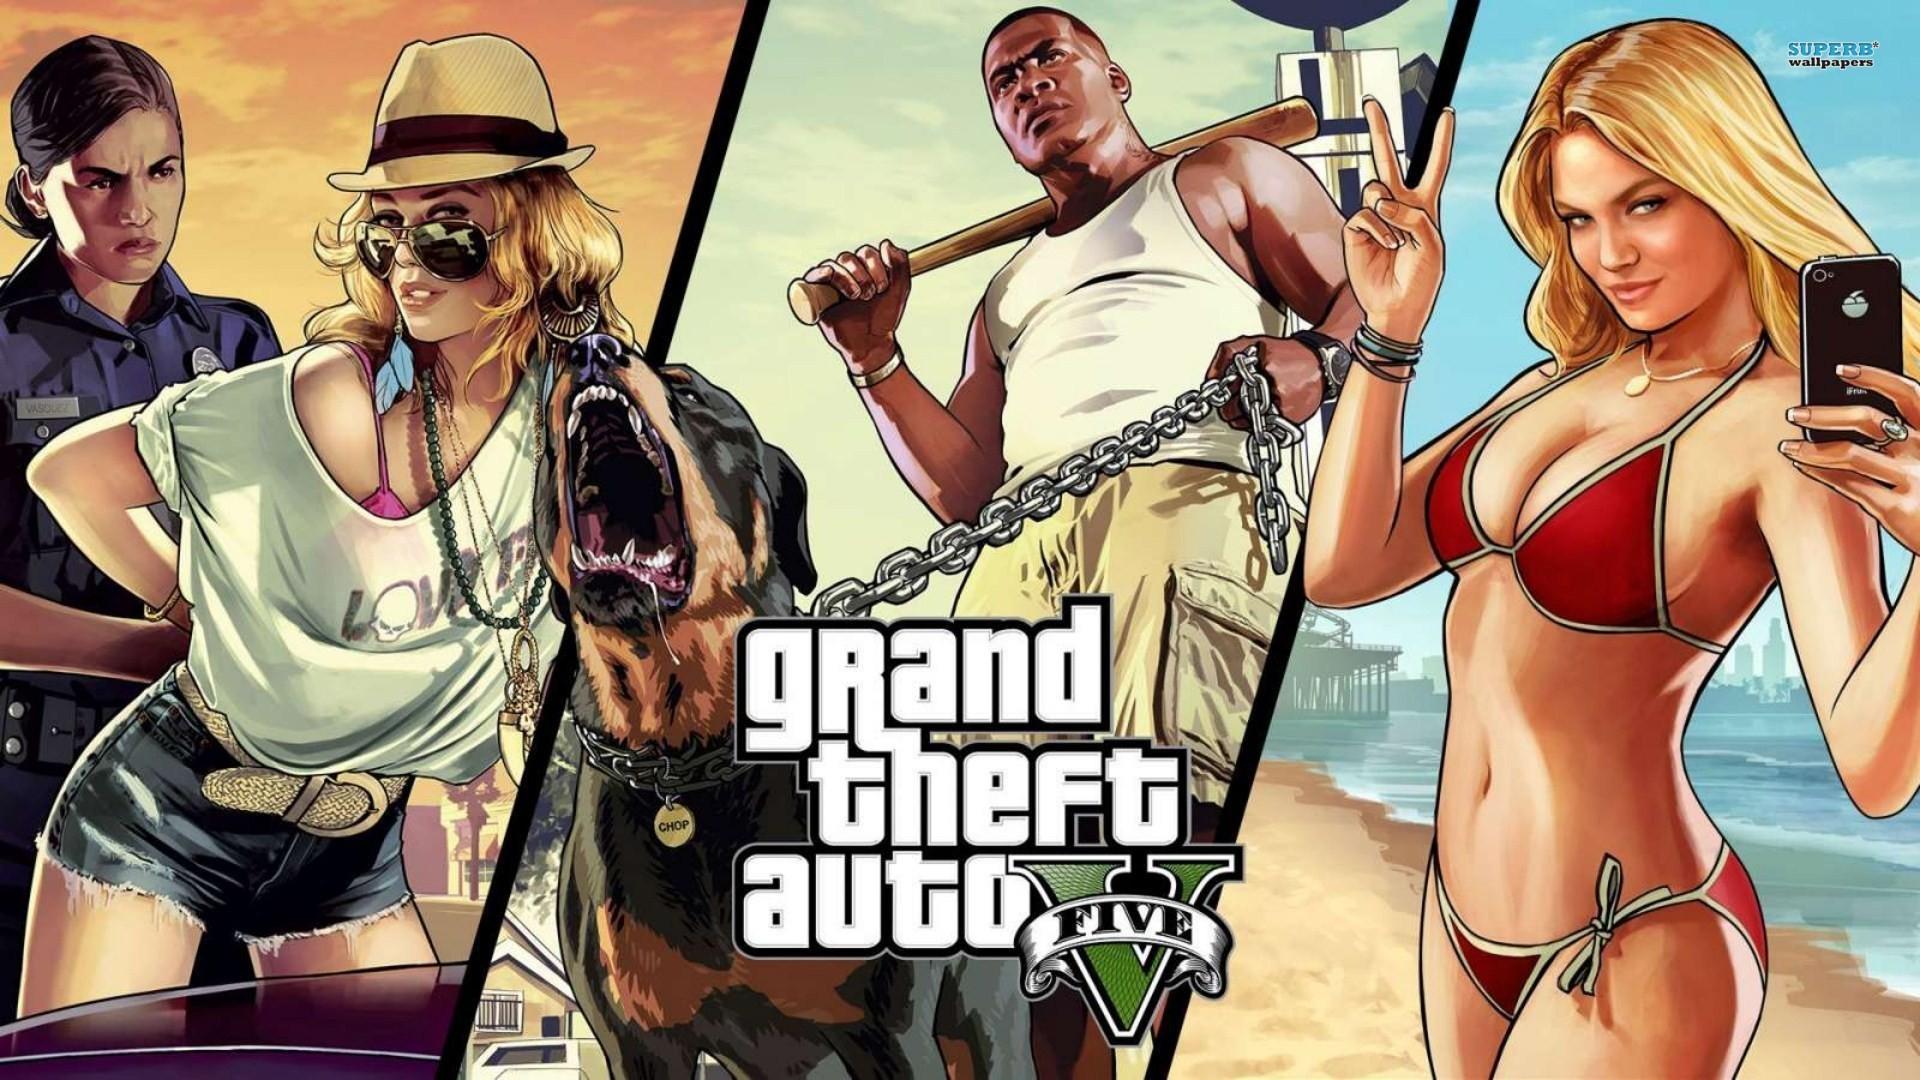 Video Game – Grand Theft Auto V Wallpaper